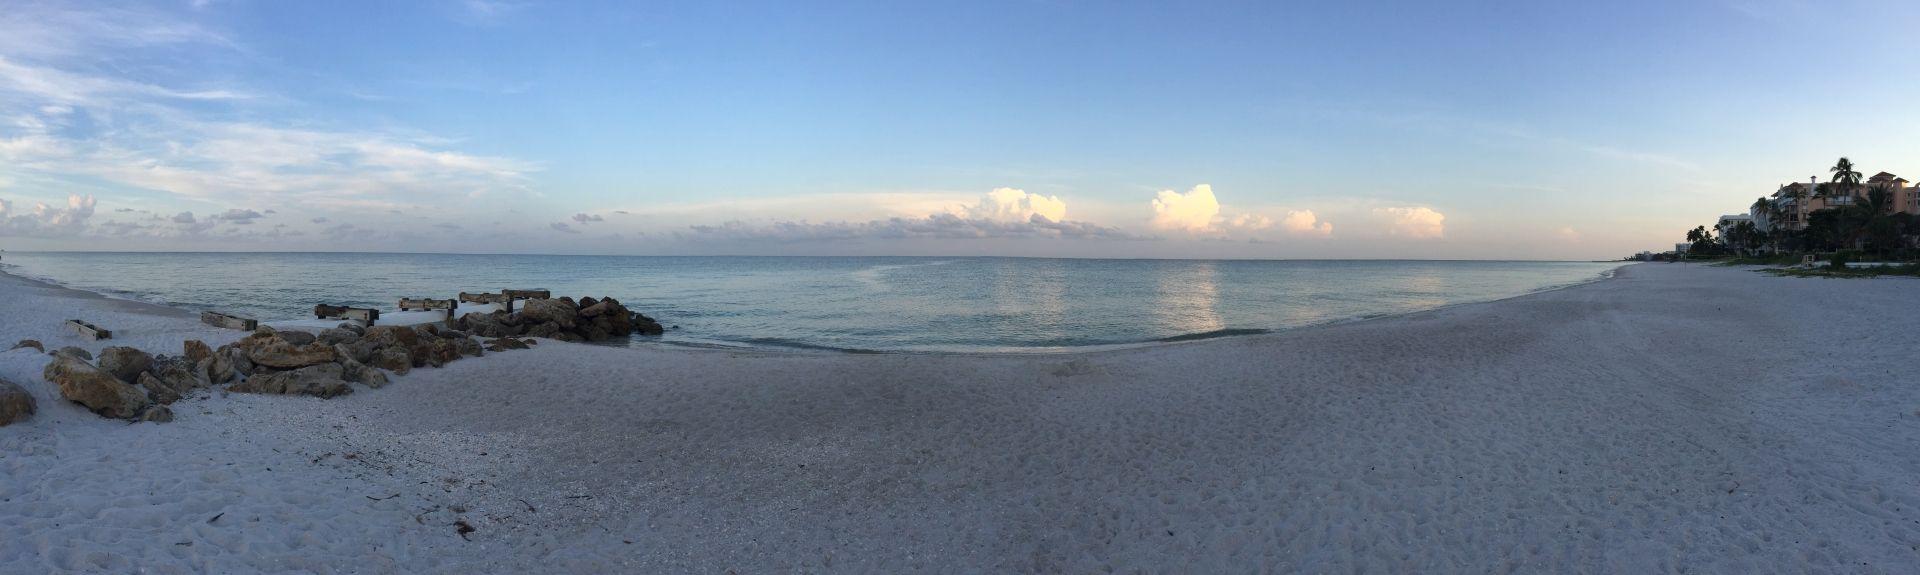 beautiful beach sunrise in naples fl [ 1920 x 575 Pixel ]